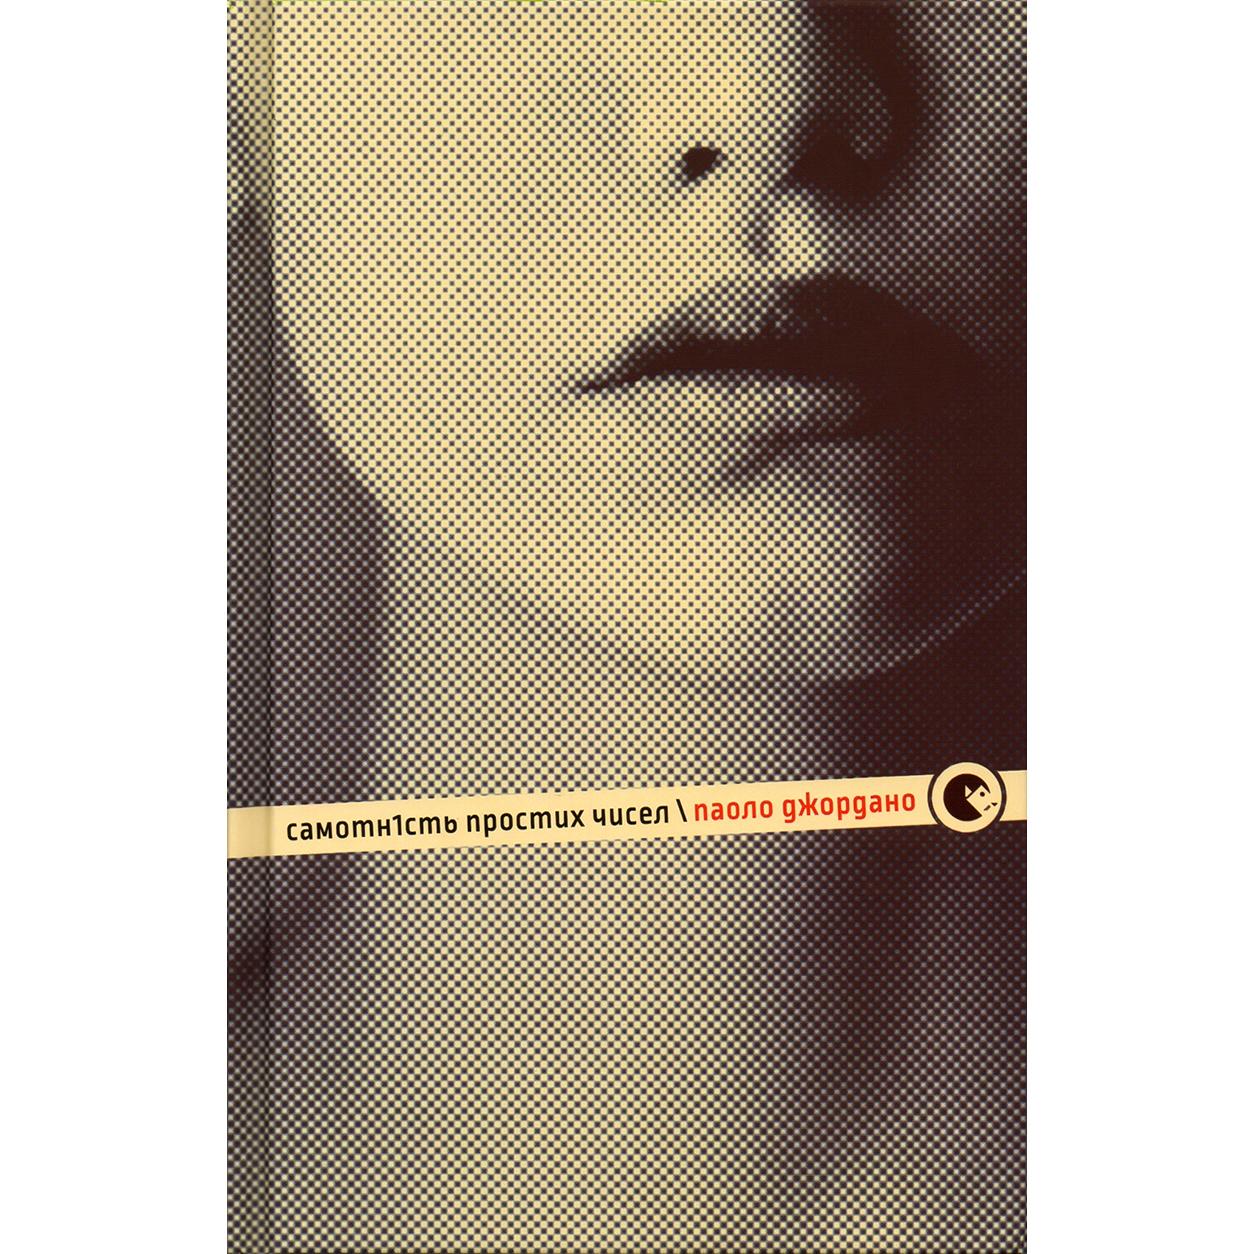 Купити книгу Cамотність простих чисел, Паоло Джордано | Bukio